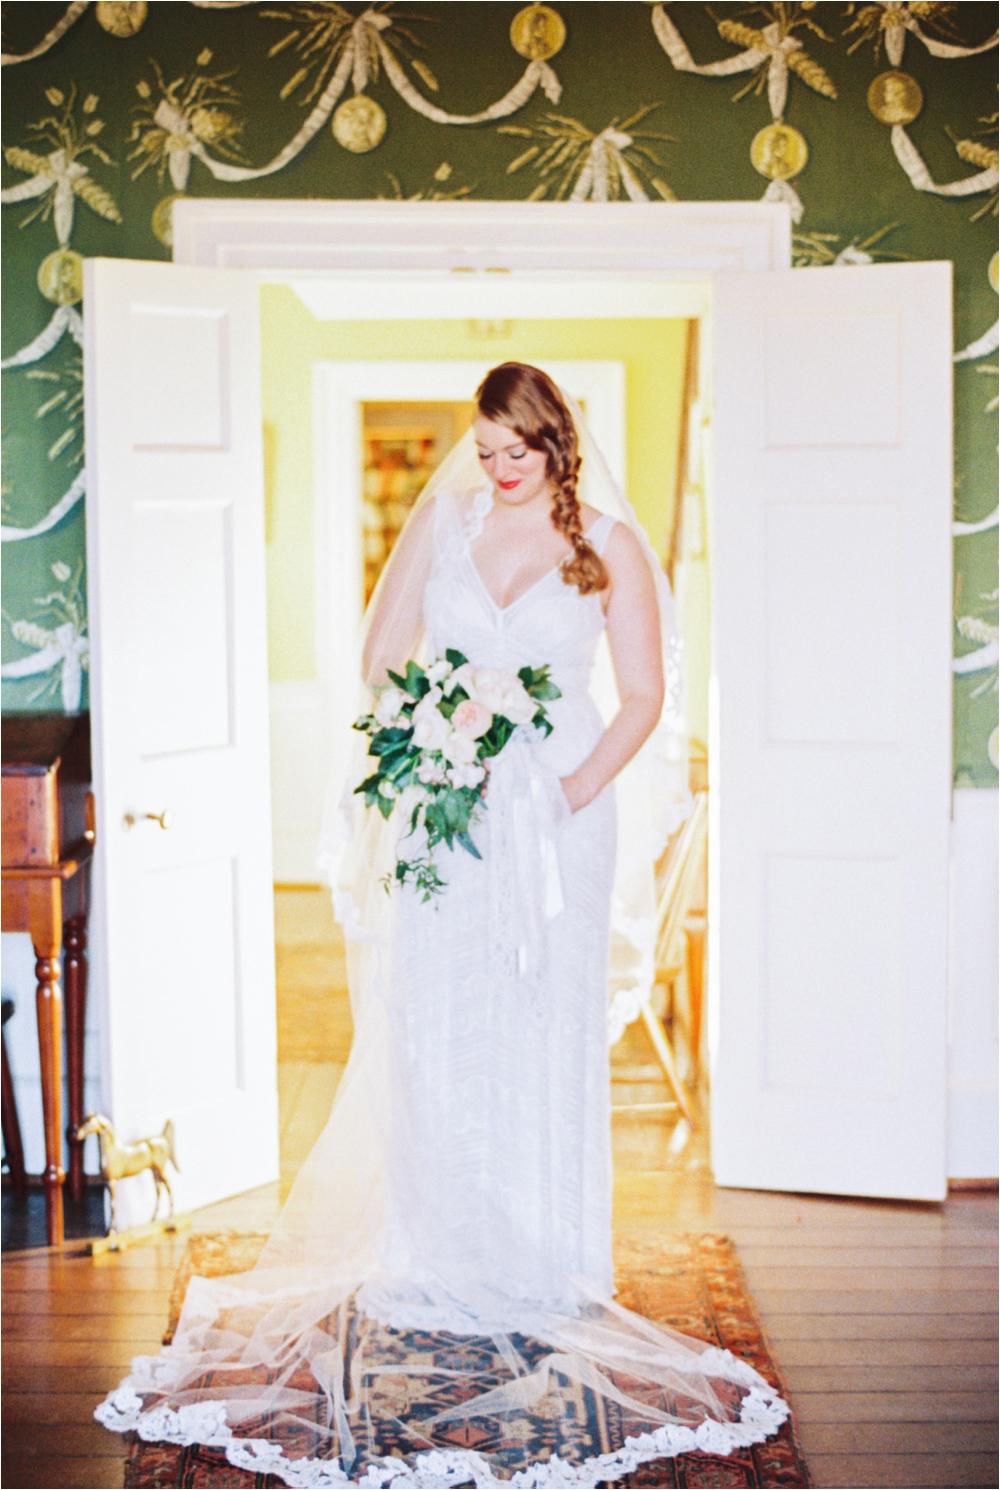 saint-patricks-day-wedding-inspiration-stephanie-yonce_0028